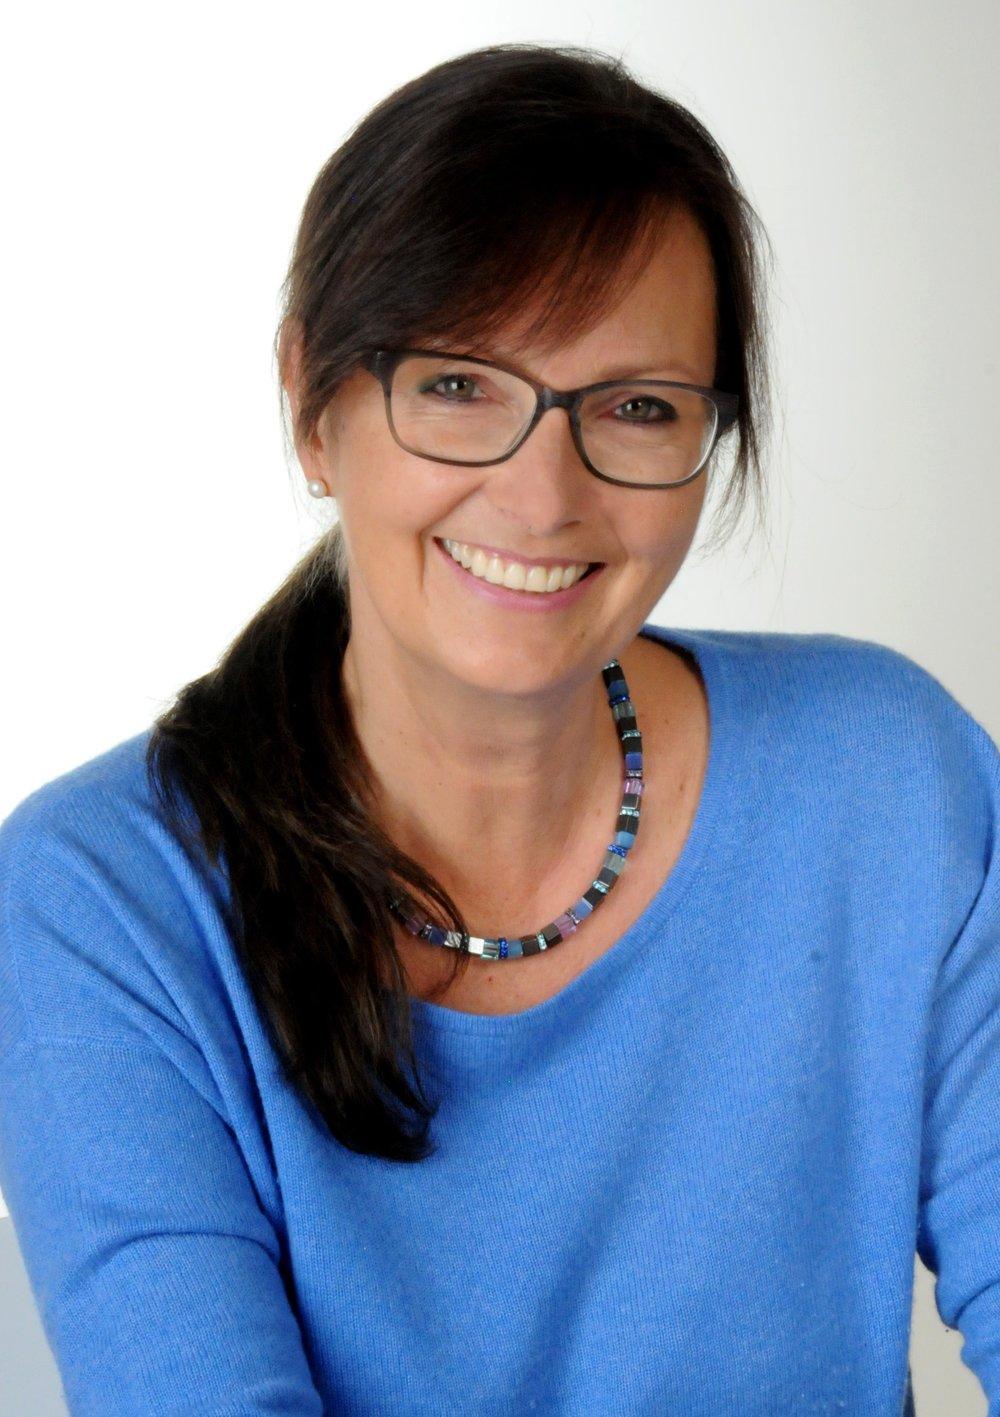 Barbara Sch.jpg